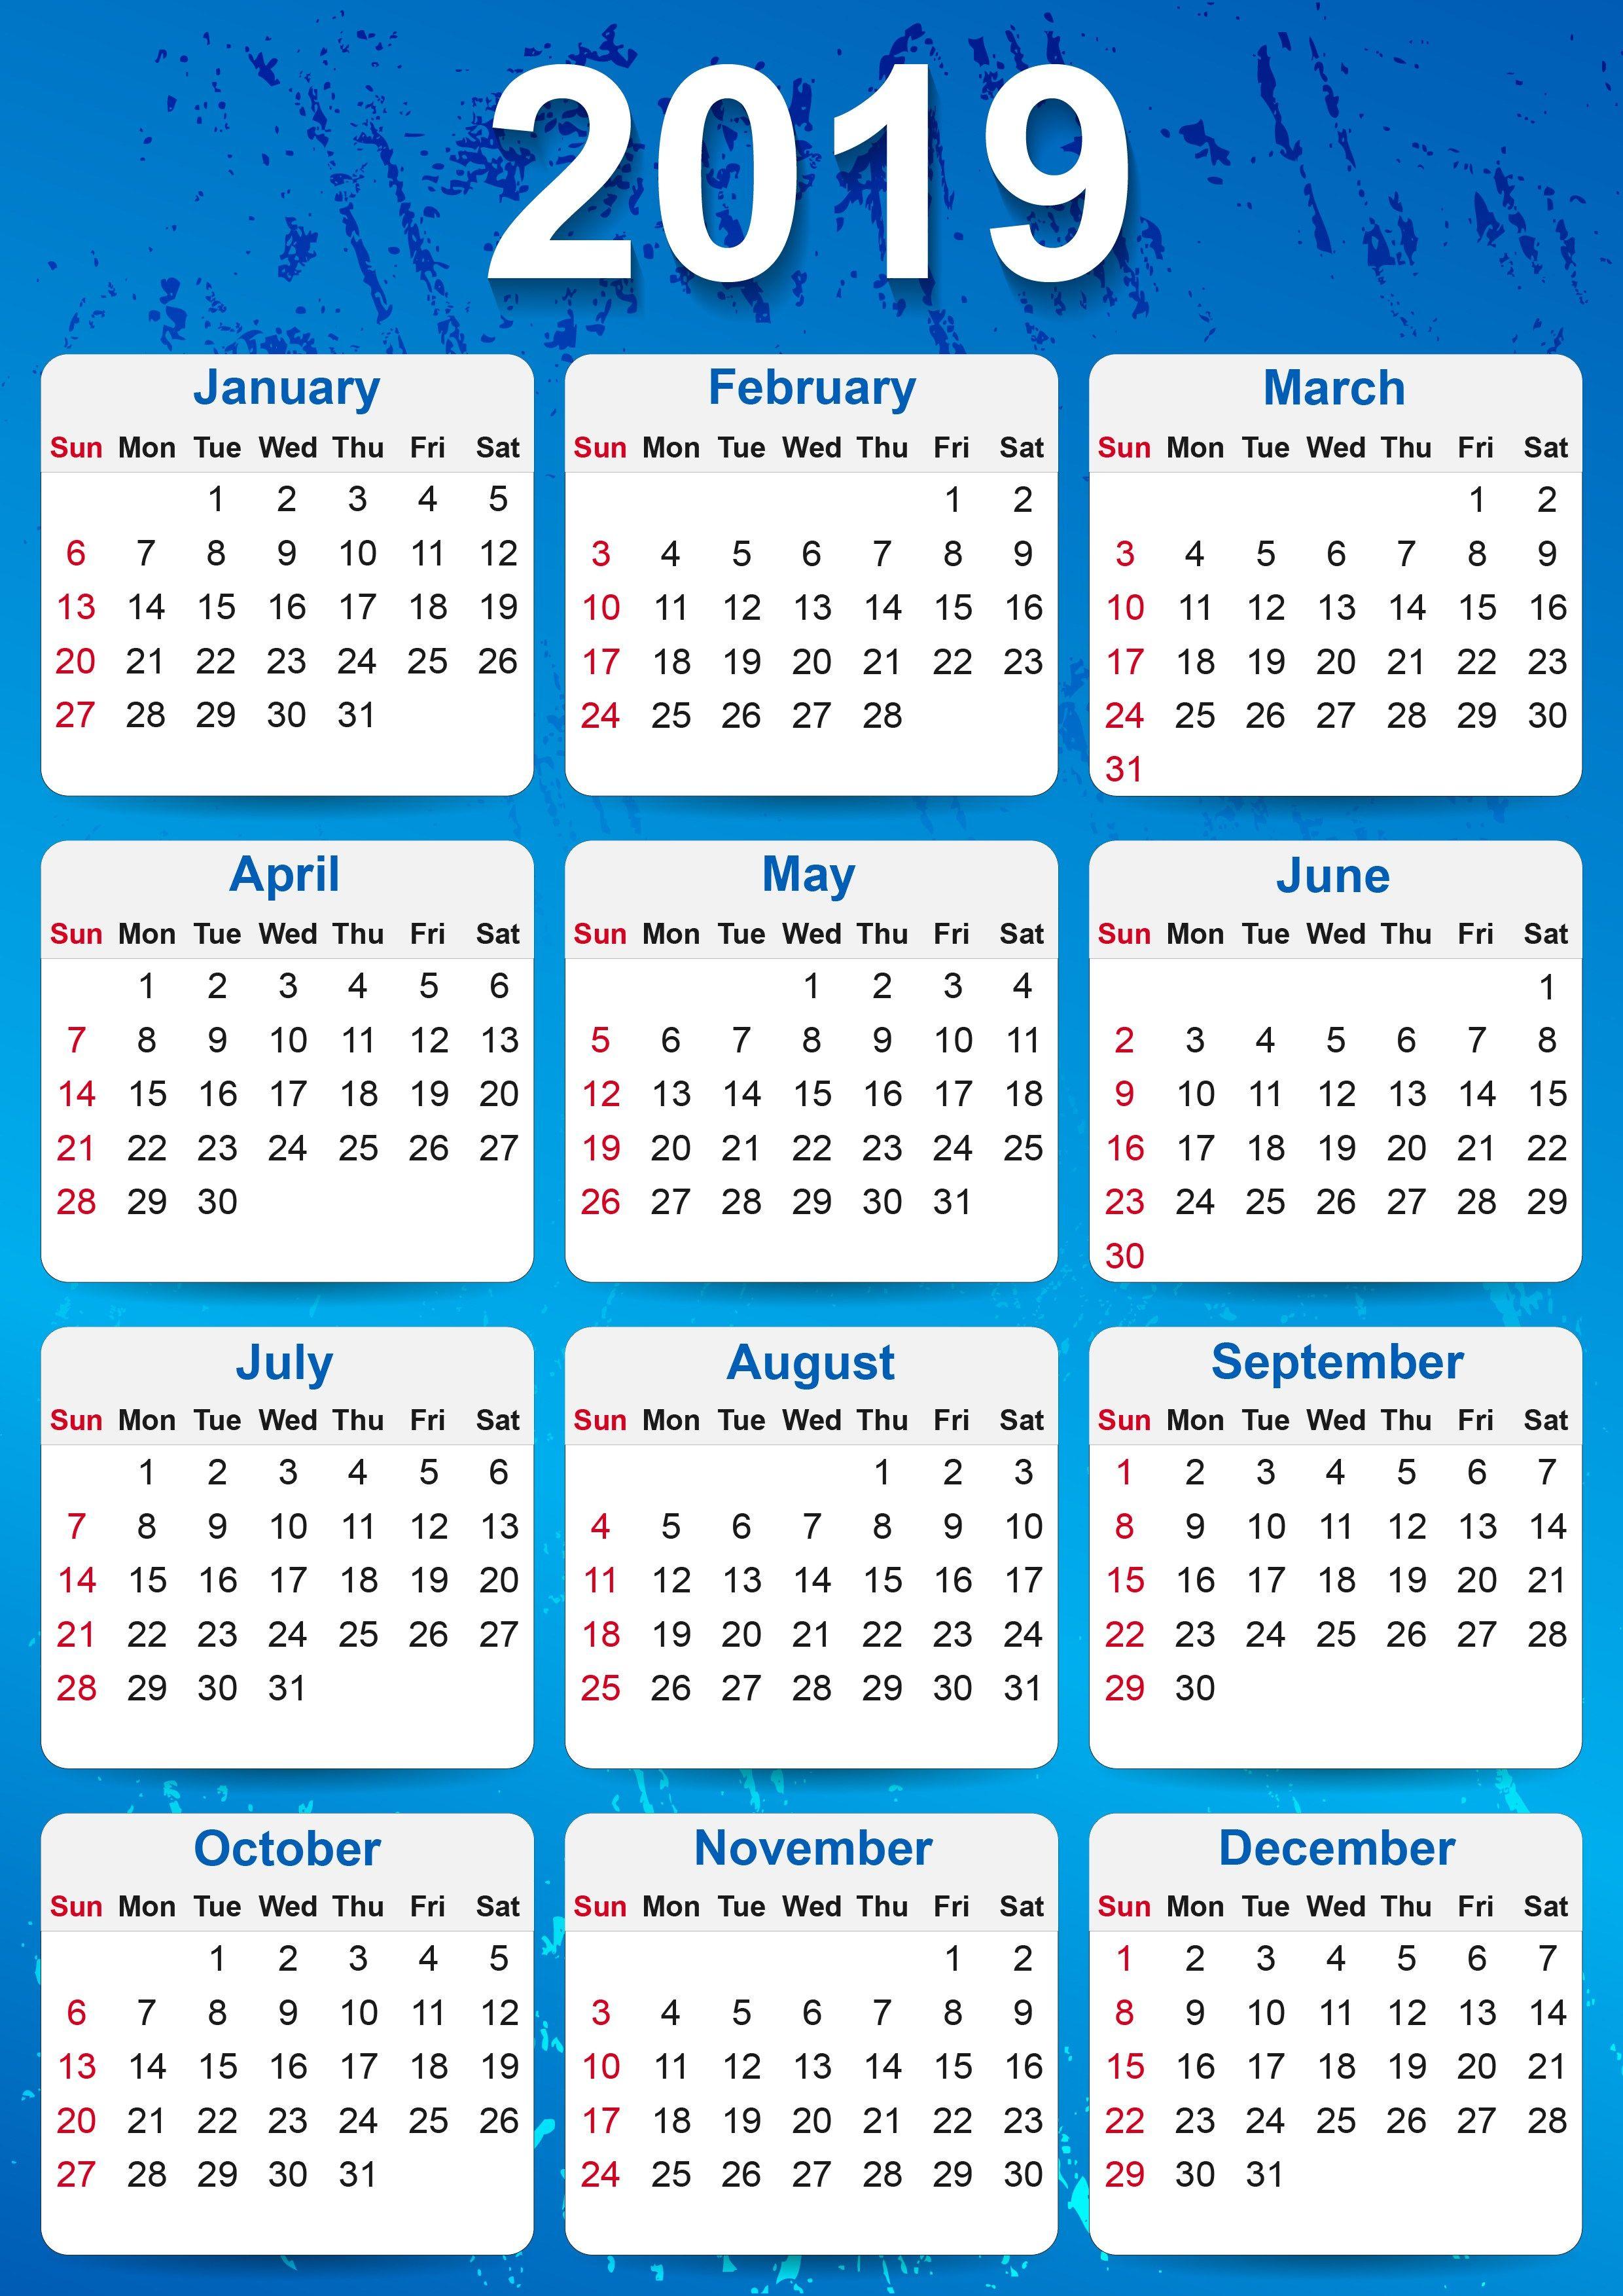 2019 Yearly Calendar Printable | Calendar | 2019 Yearly Calendar throughout Frame Birthday Calendar Templates Free